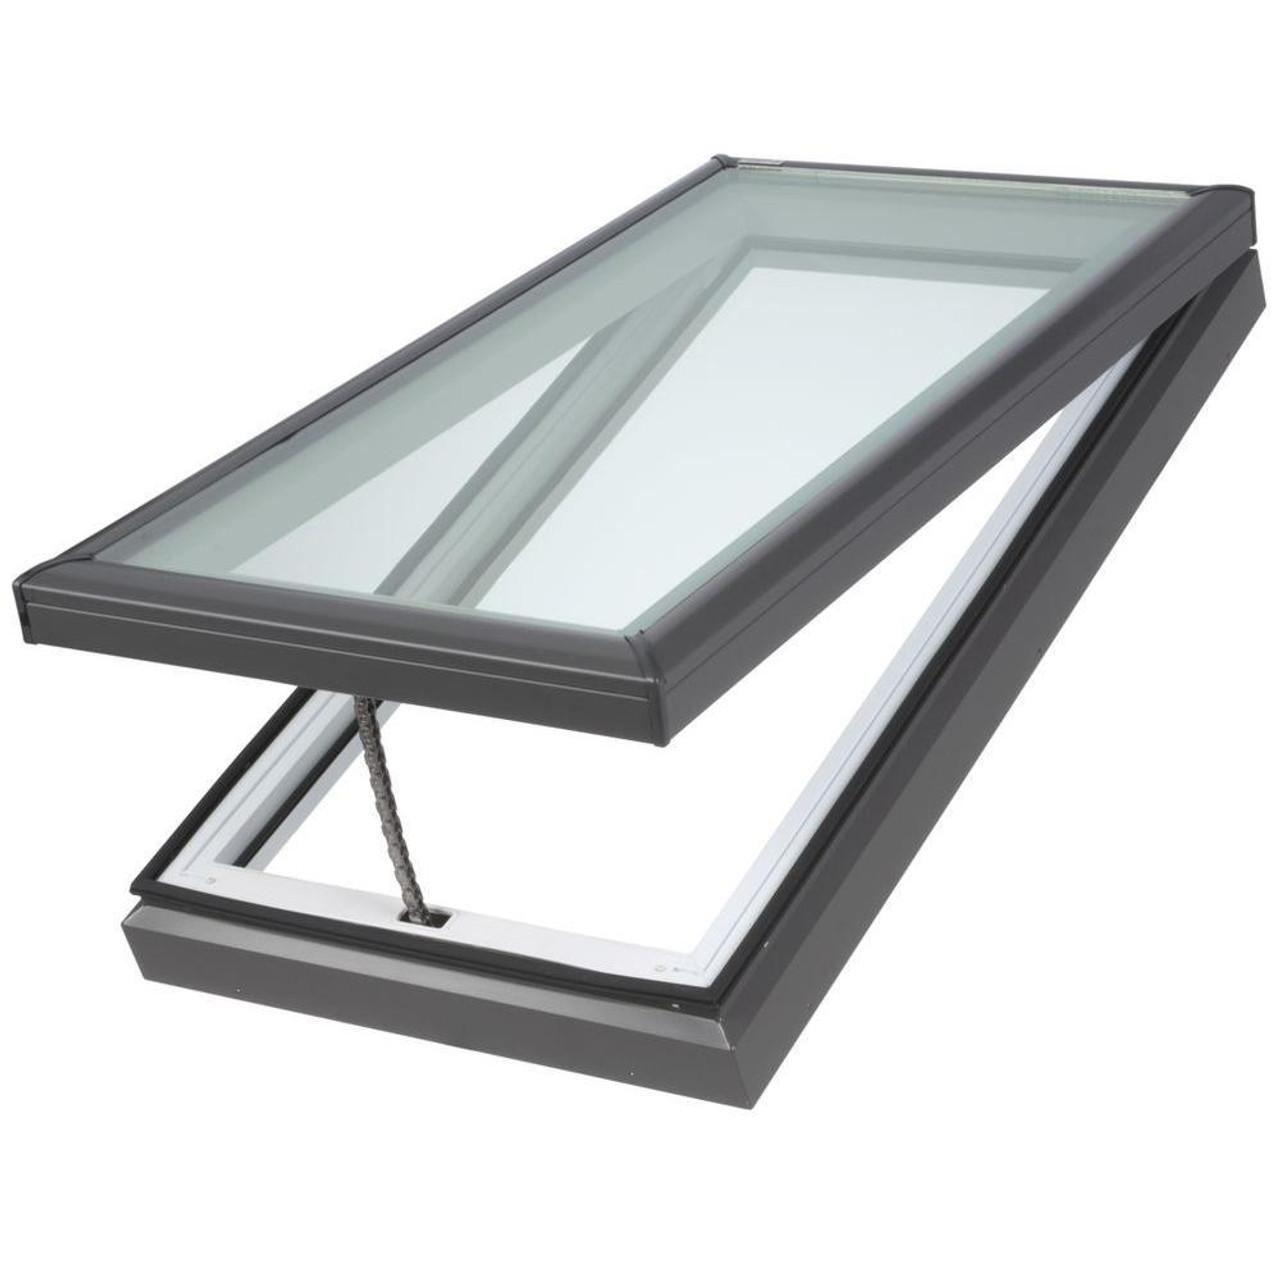 Velux Vcm 2246 Manual Venting Skylight Solartown Com